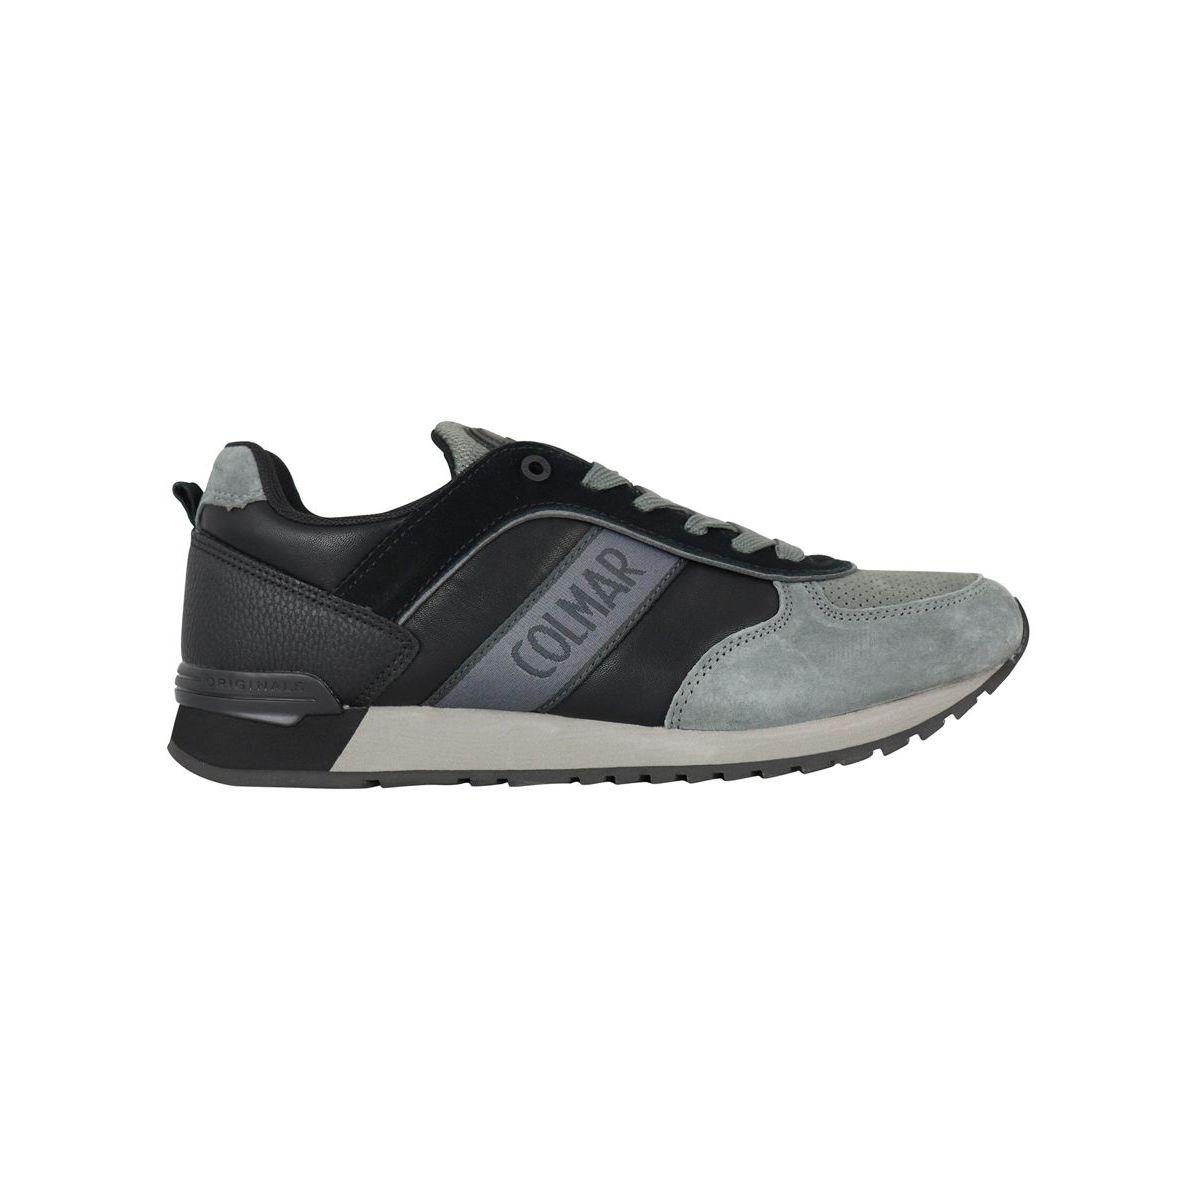 Runner Prime Sneakers Black / gray Colmar Shoes